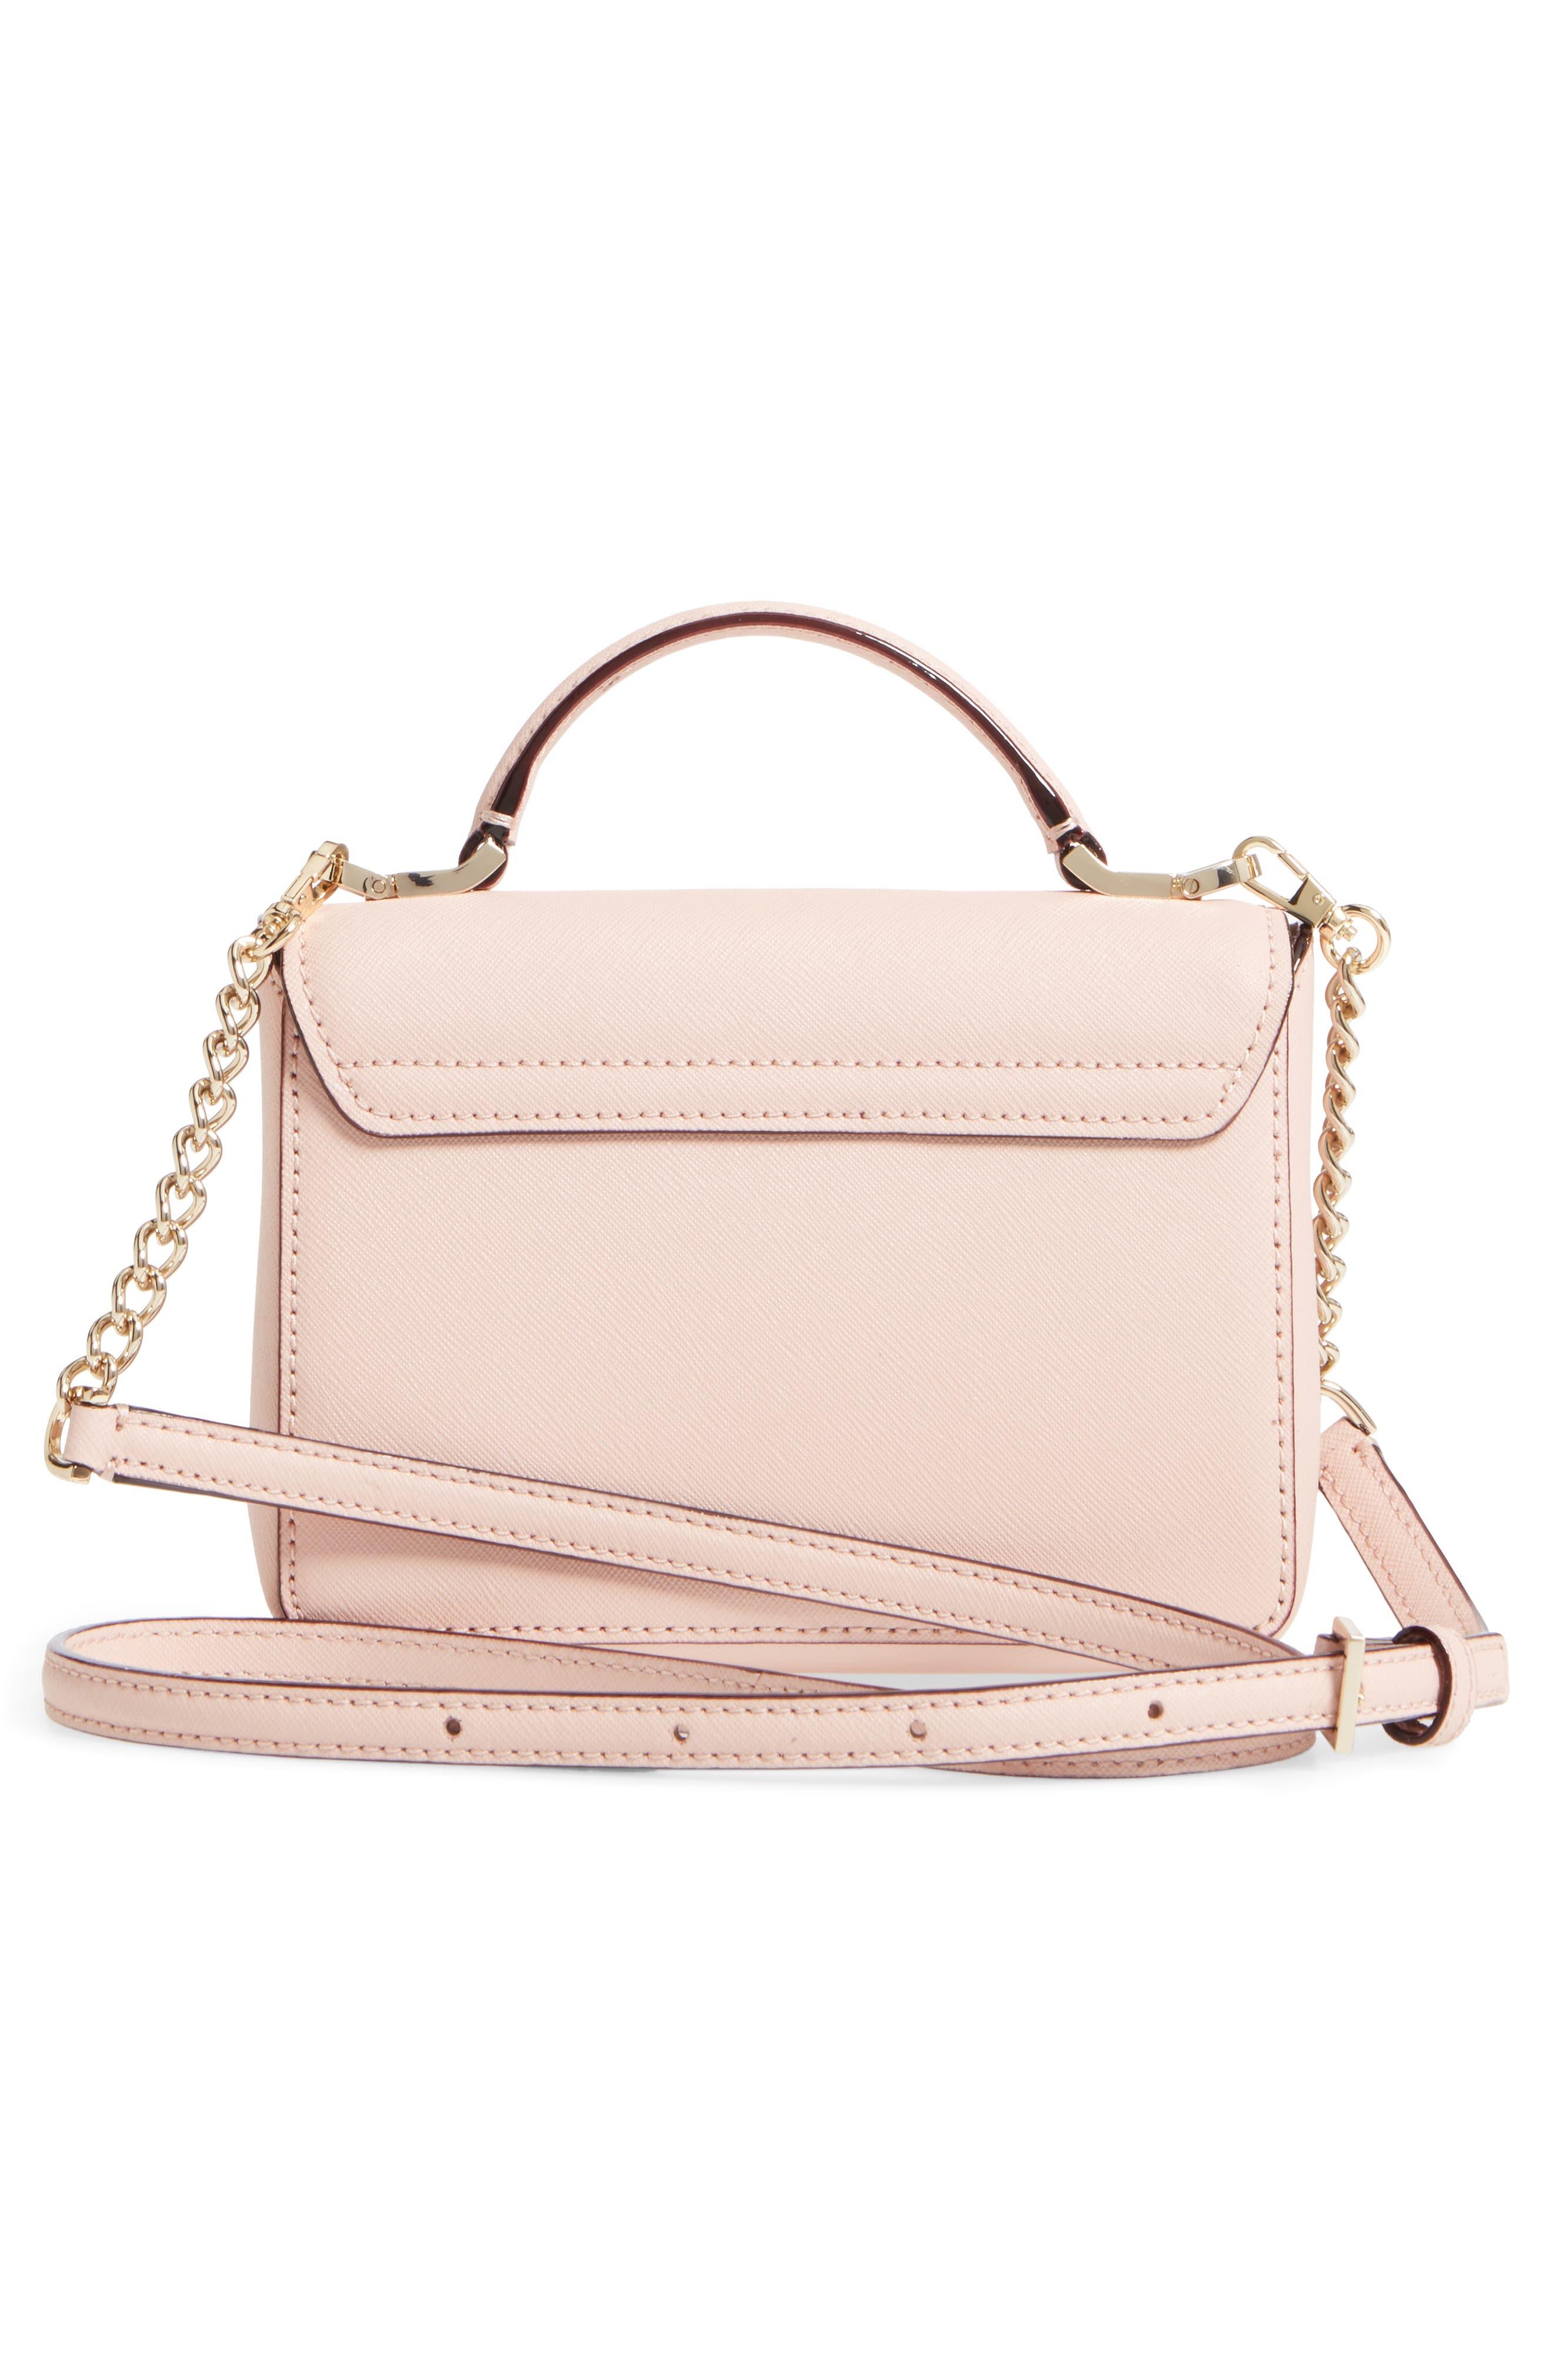 cameron street - hope saffiano leather crossbody bag,                             Alternate thumbnail 9, color,